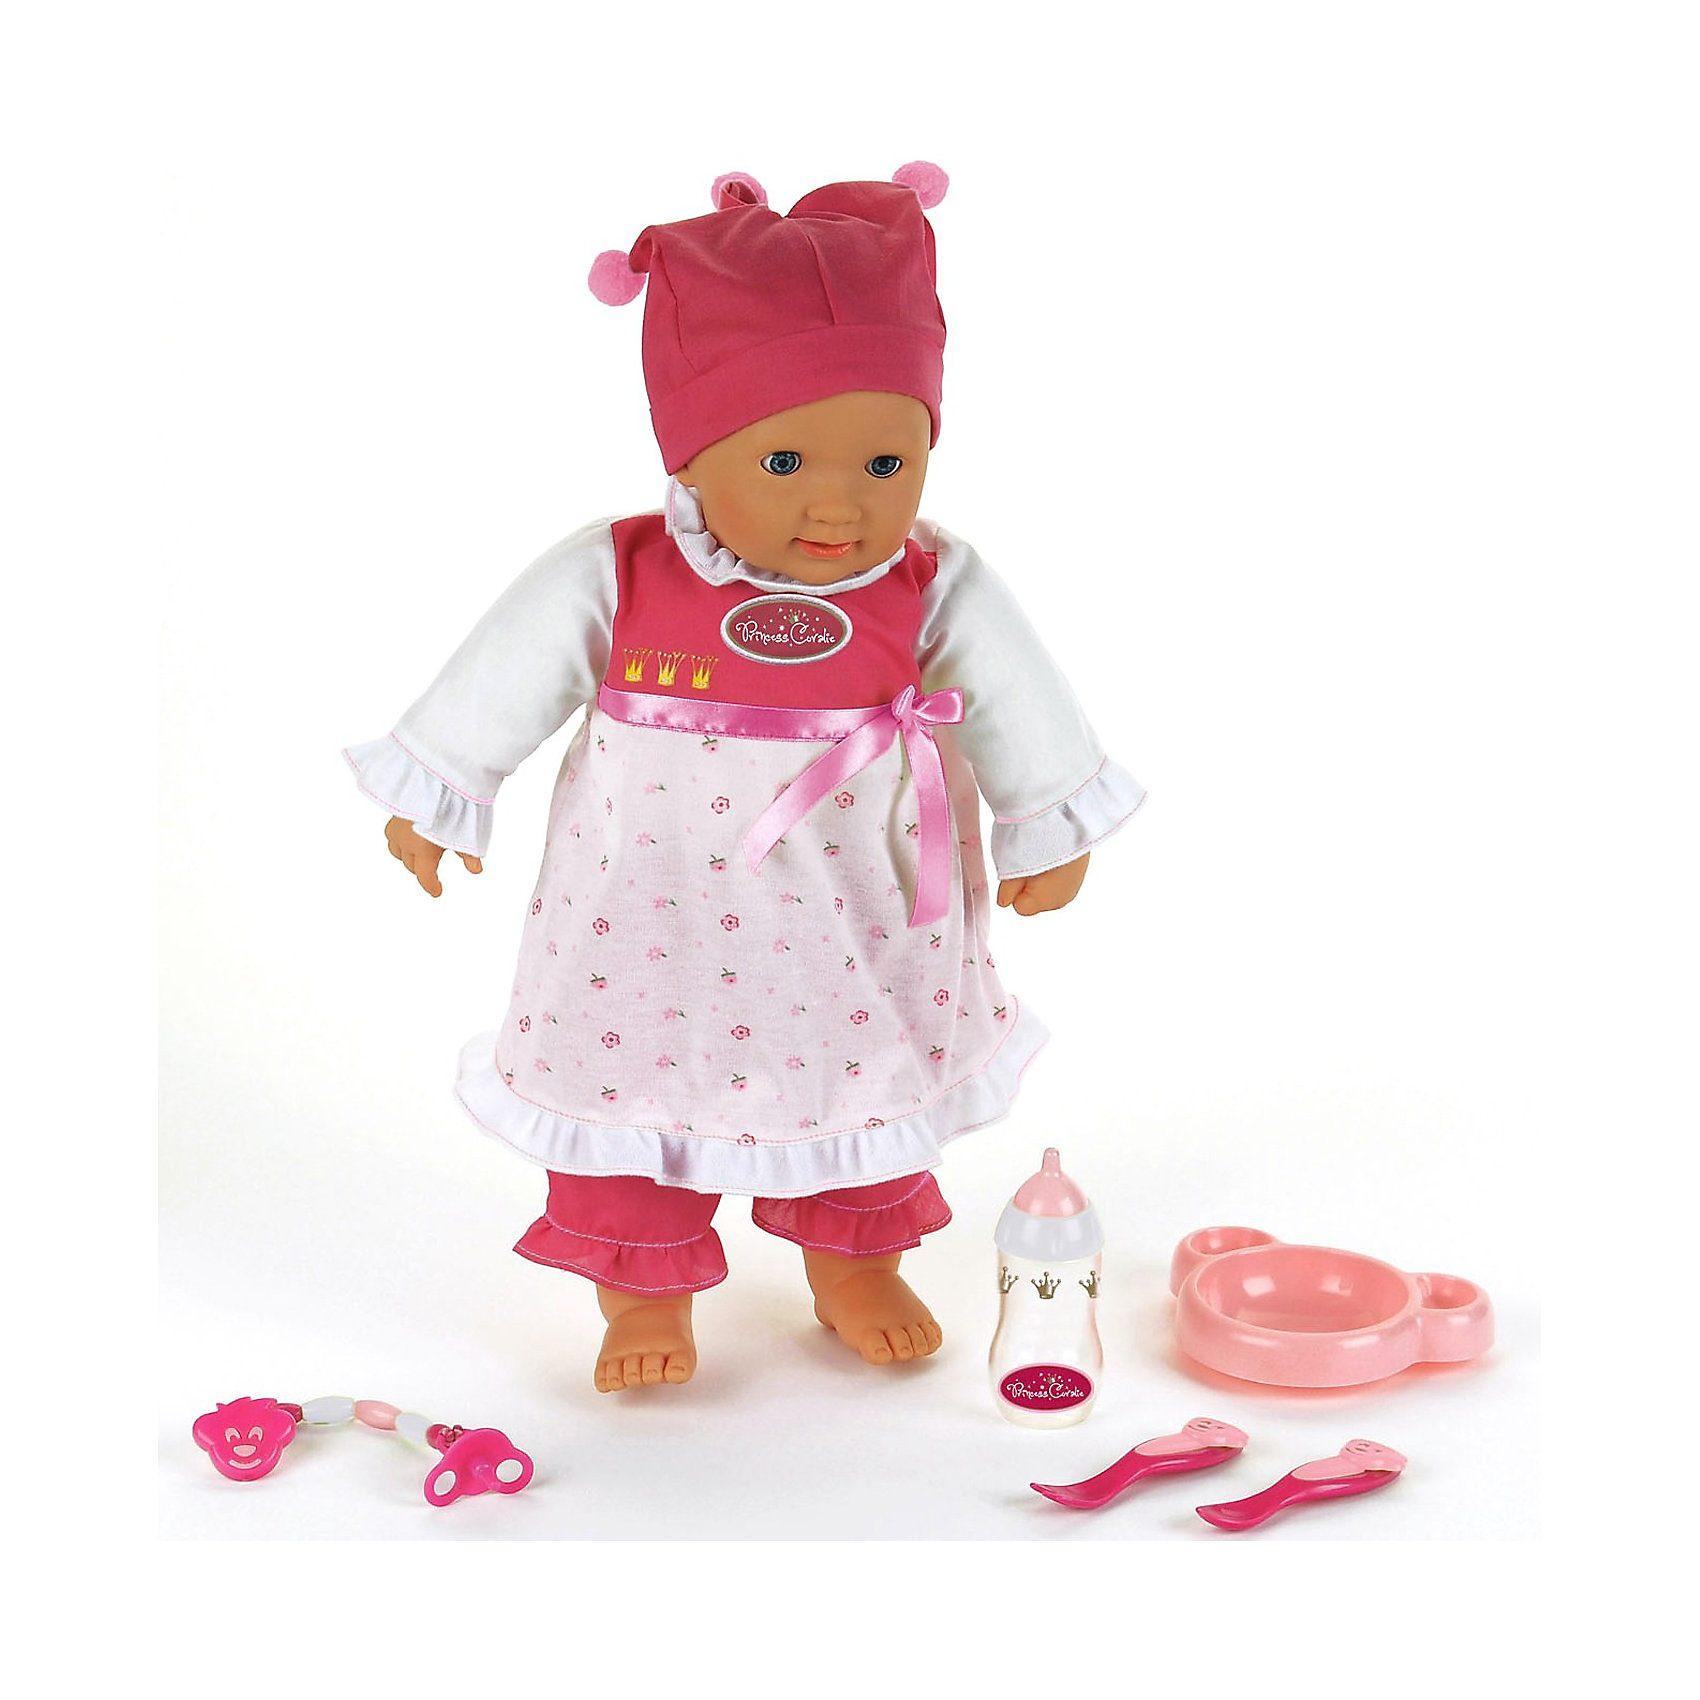 Klein Princess Coralie interaktive Babypuppe, 46 cm